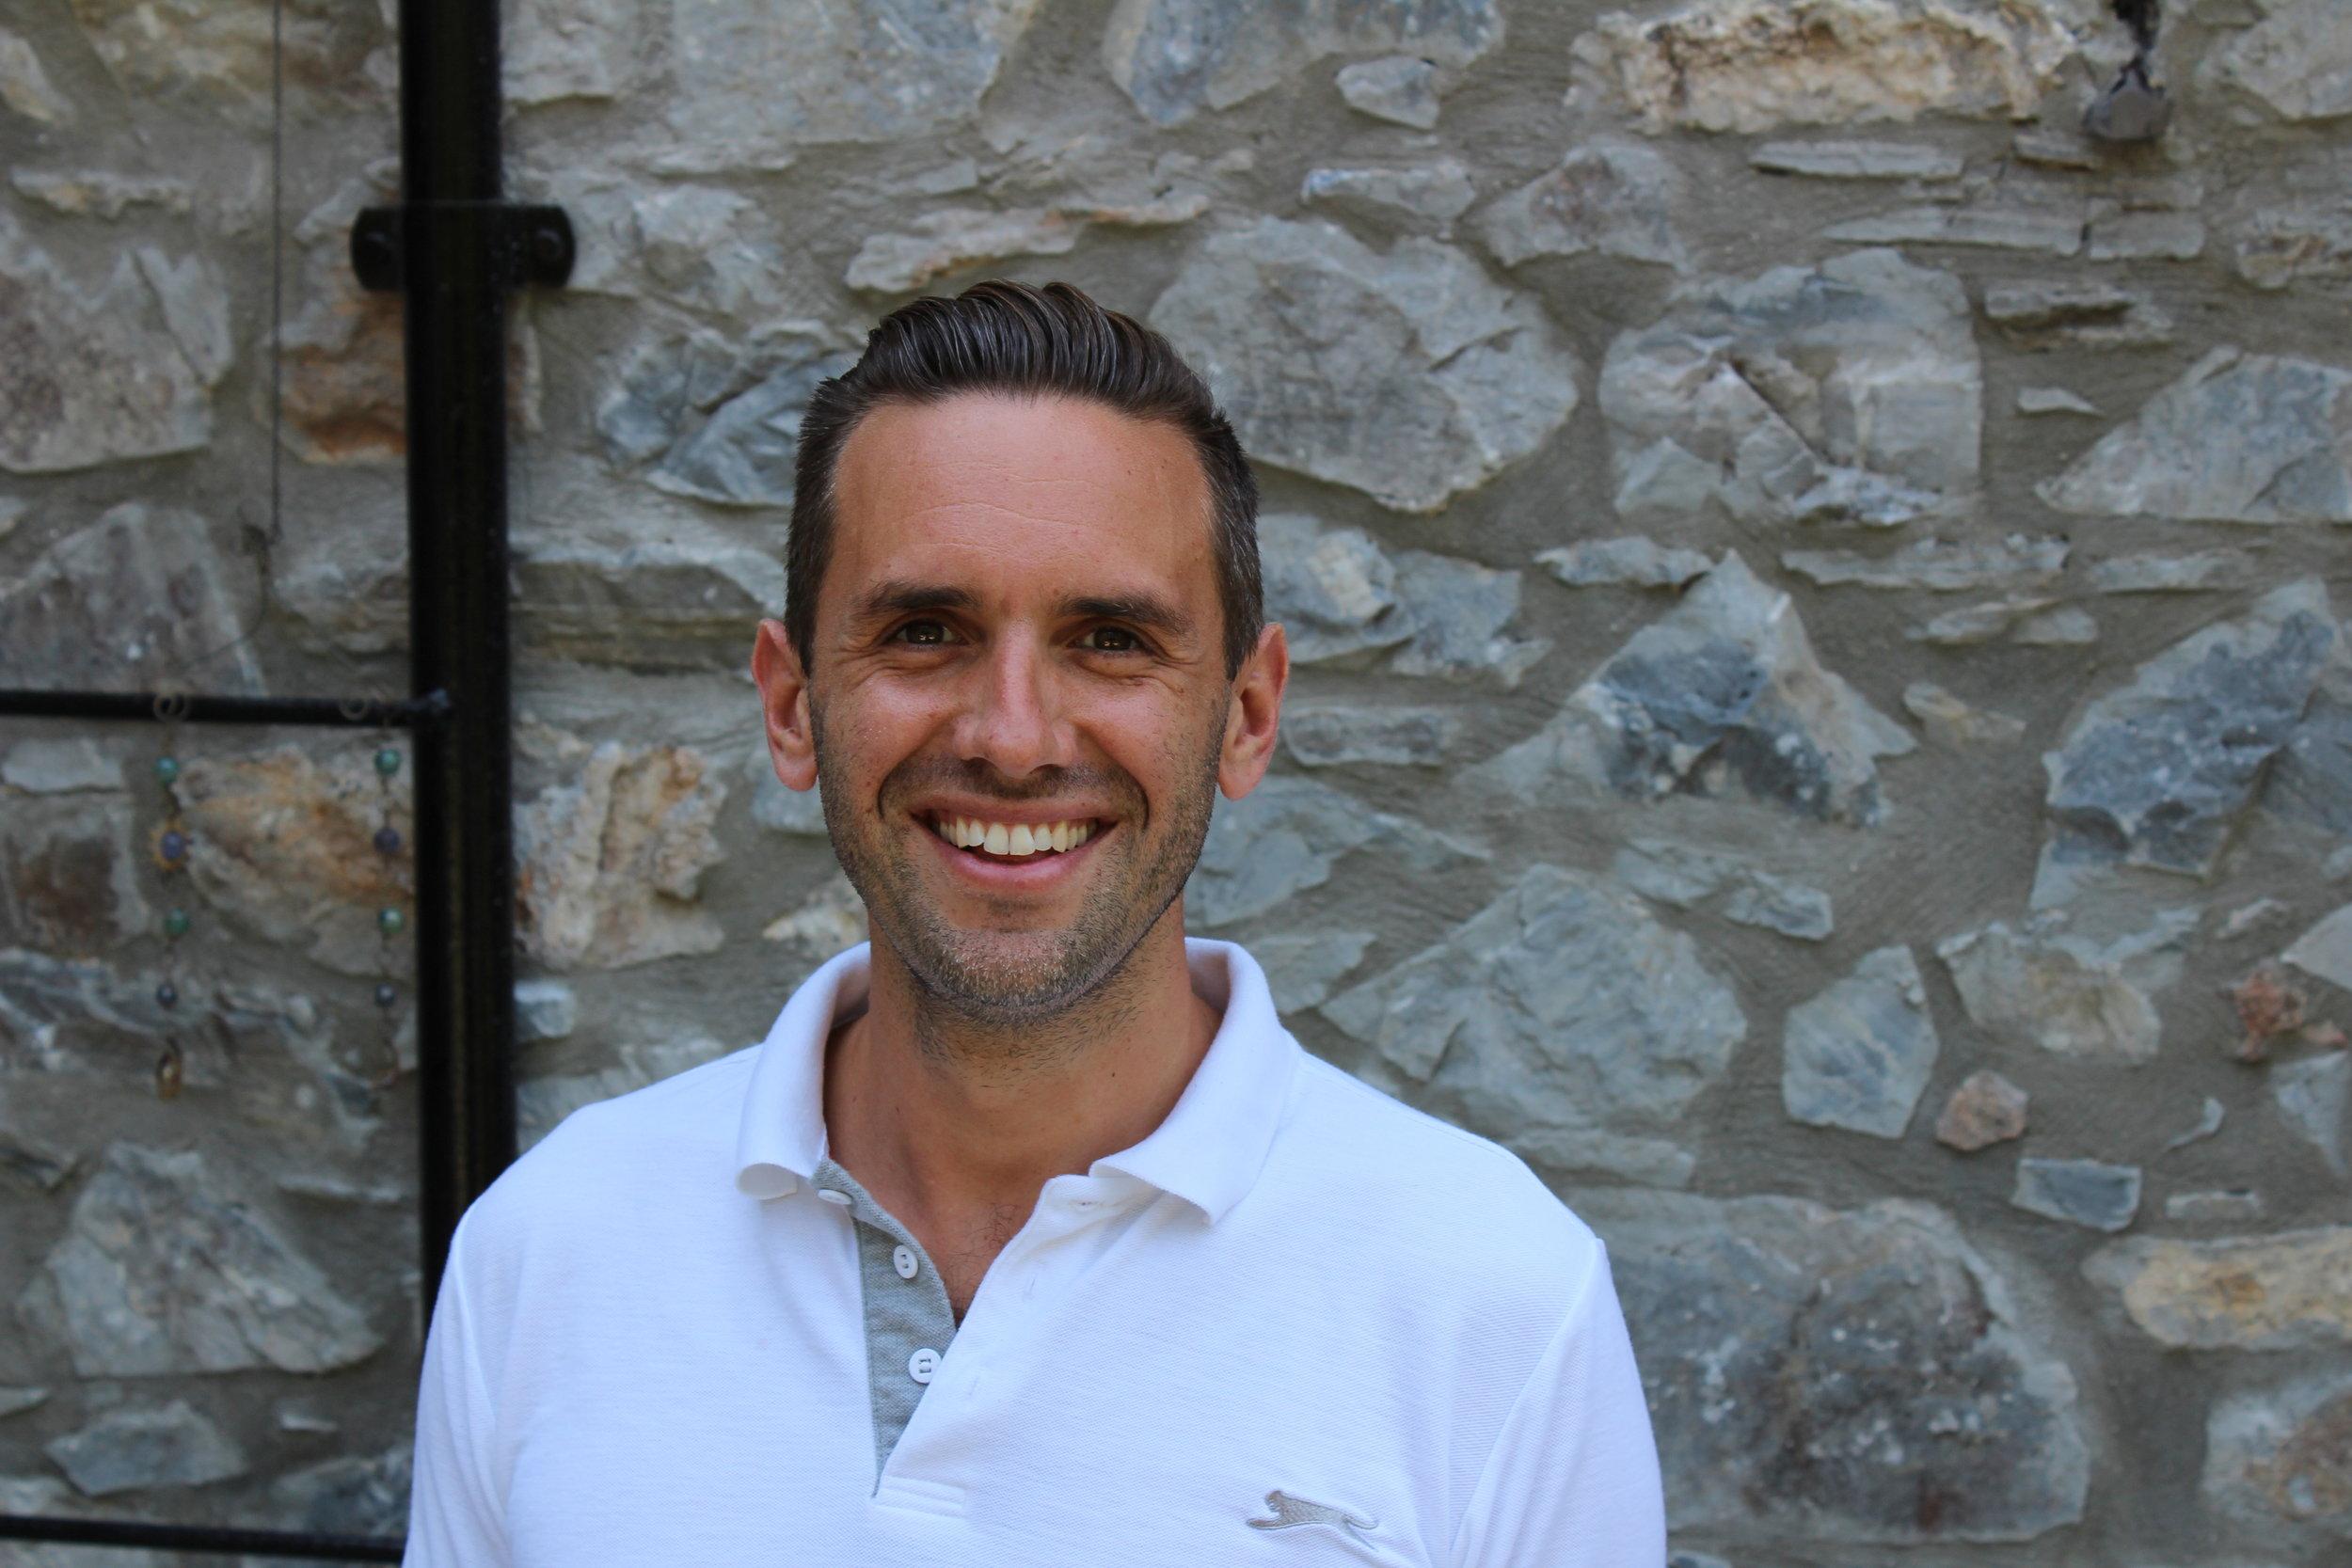 Ricky Reemer, CEO